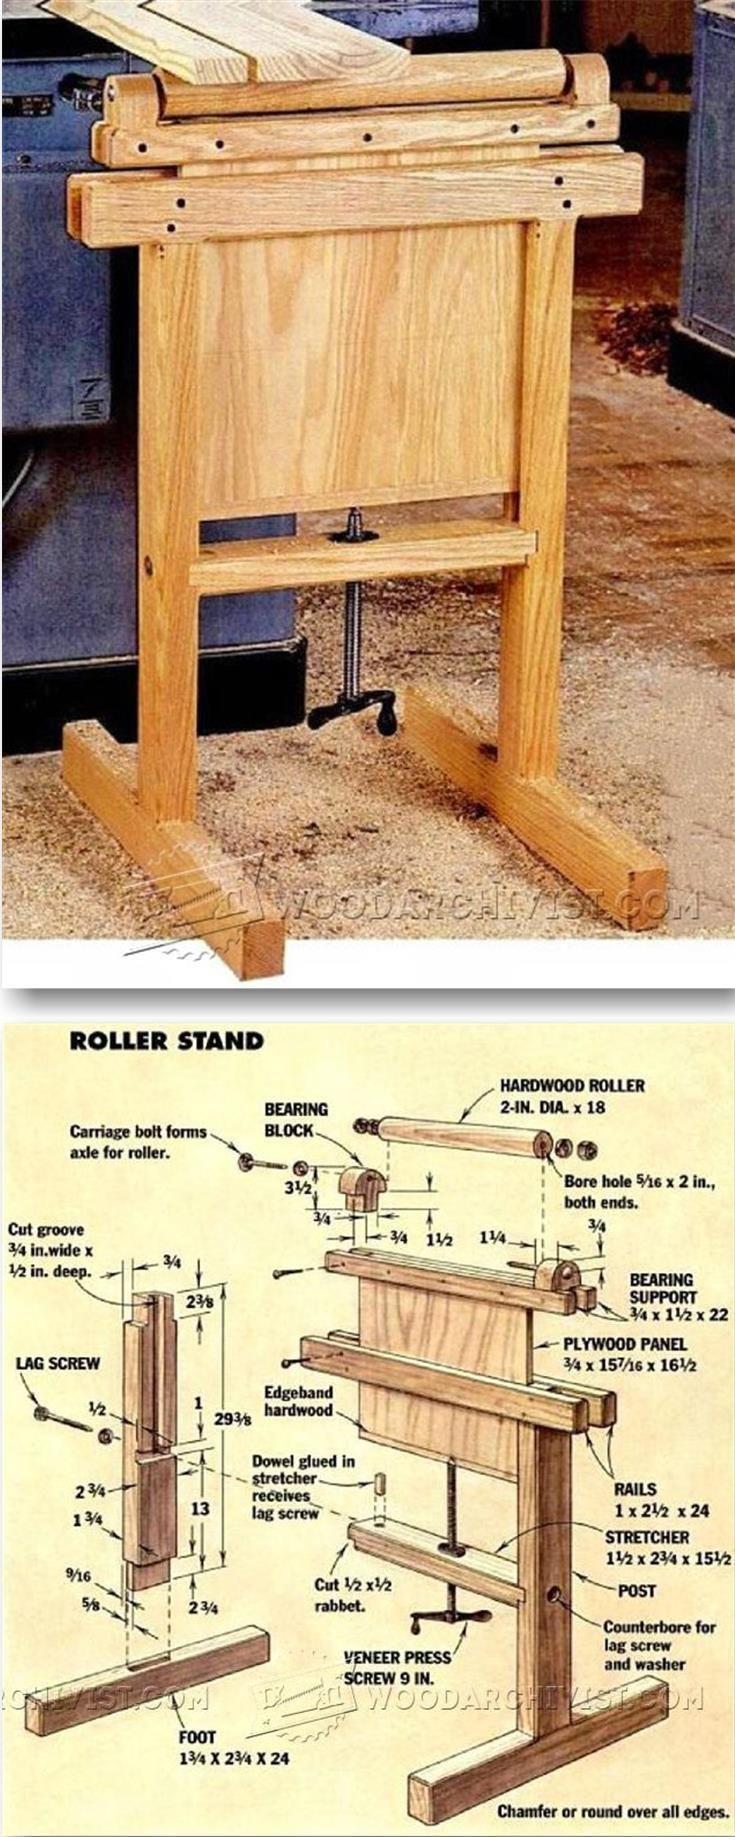 Roller Stand Plans - Workshop Solutions Plans, Tips and Tricks   WoodArchivist.com